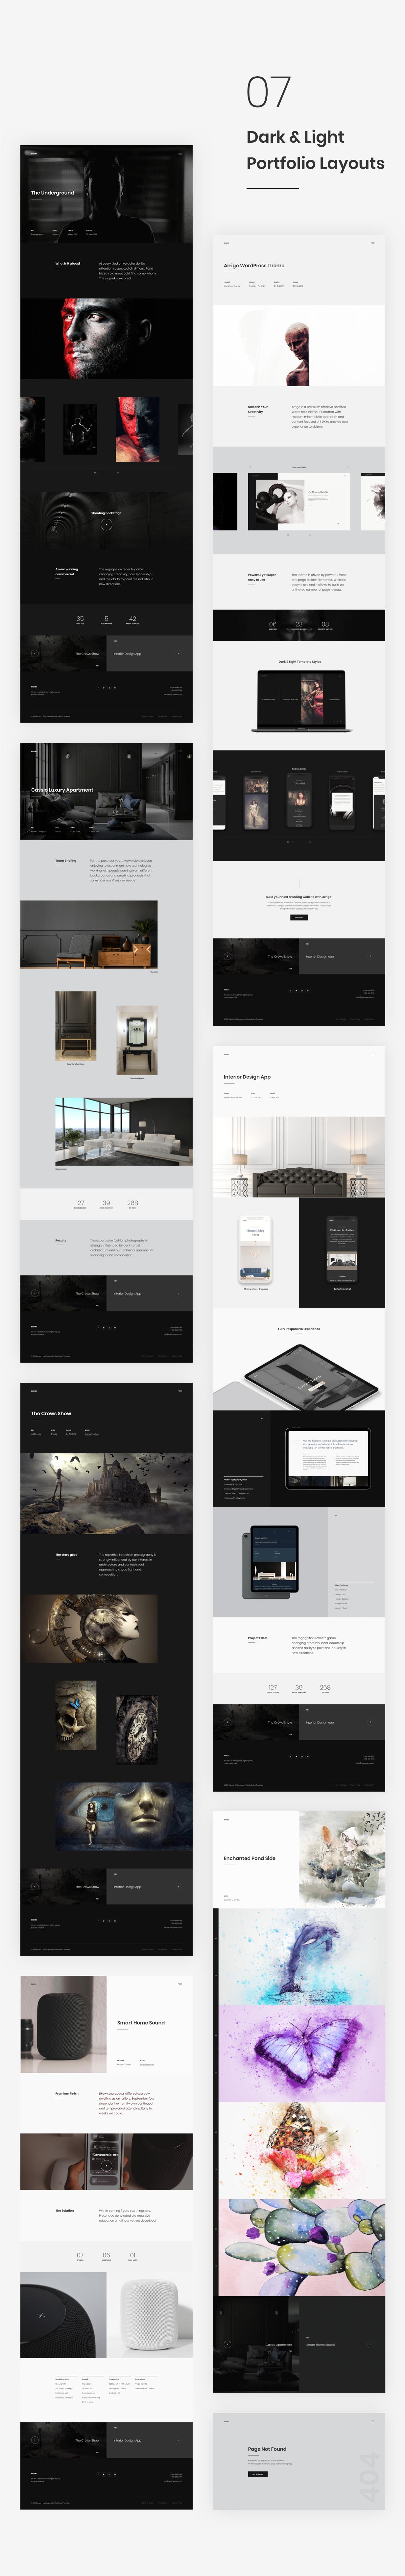 Rubenz – Creative Portfolio Showcase Sketch Template - 6